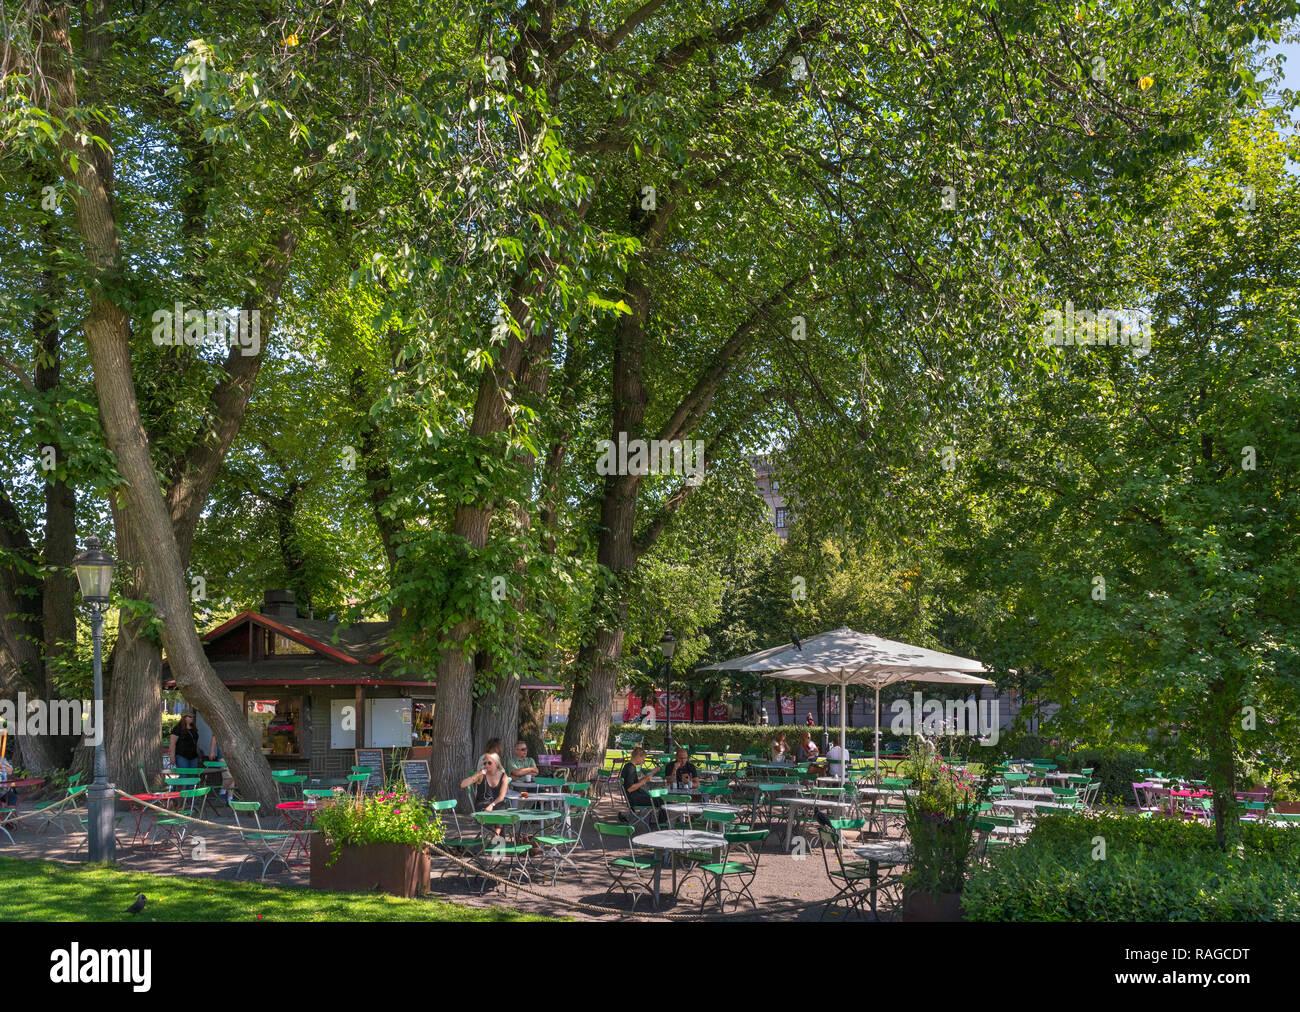 Tea room in Kungsträdgården, a park in the centre of the city, Norrmalm, Stockholm, Sweden - Stock Image